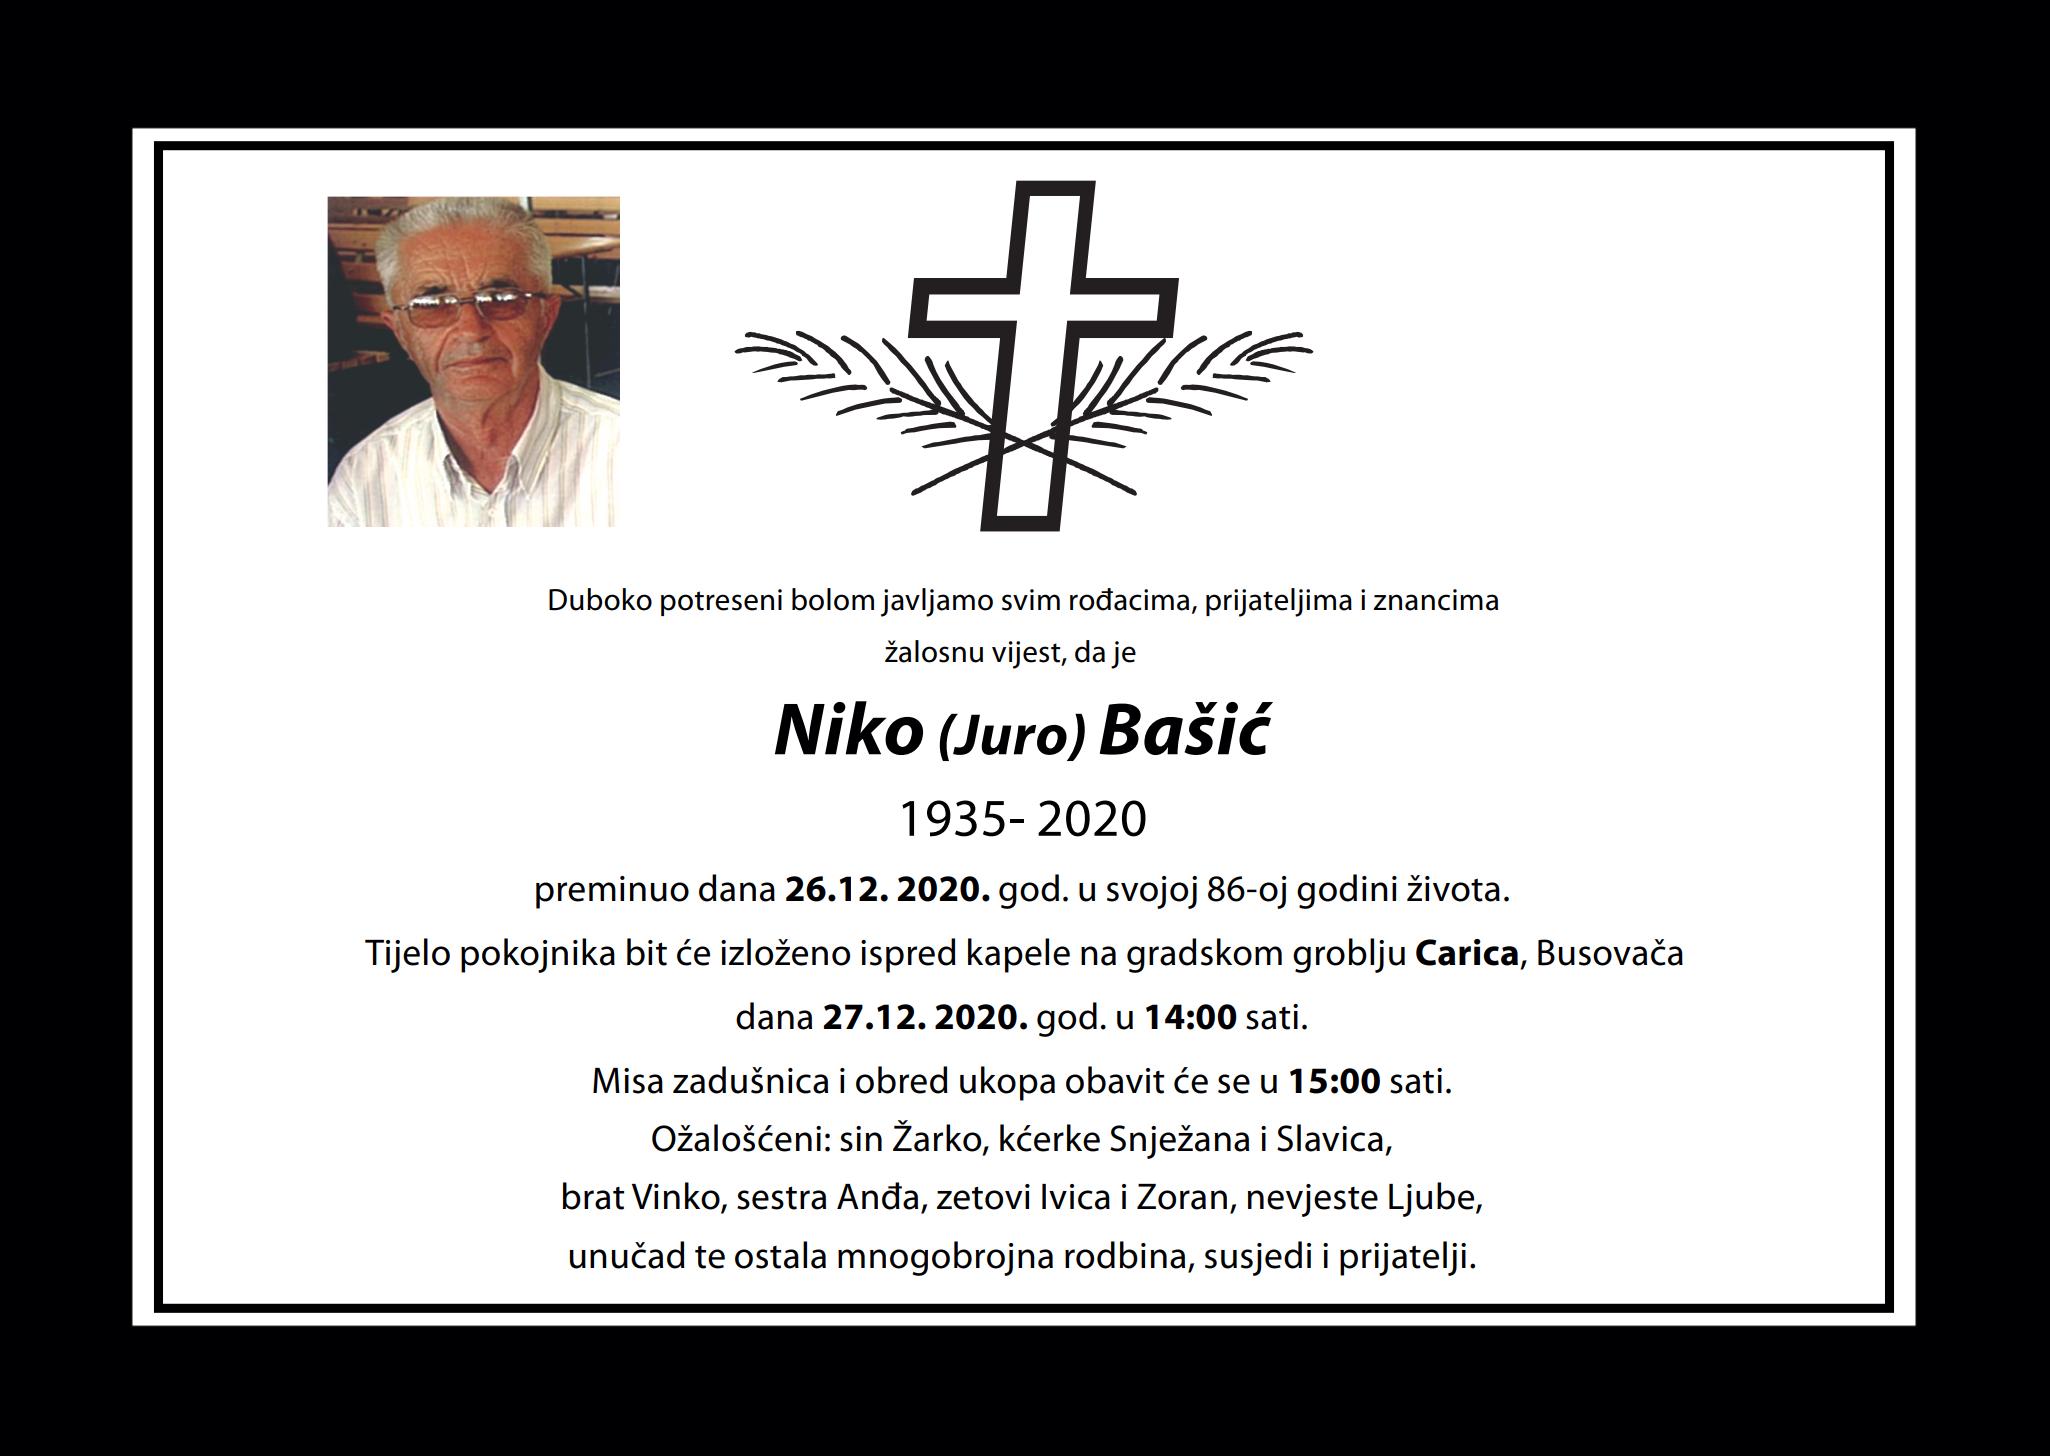 Niko (Juro) Bašić